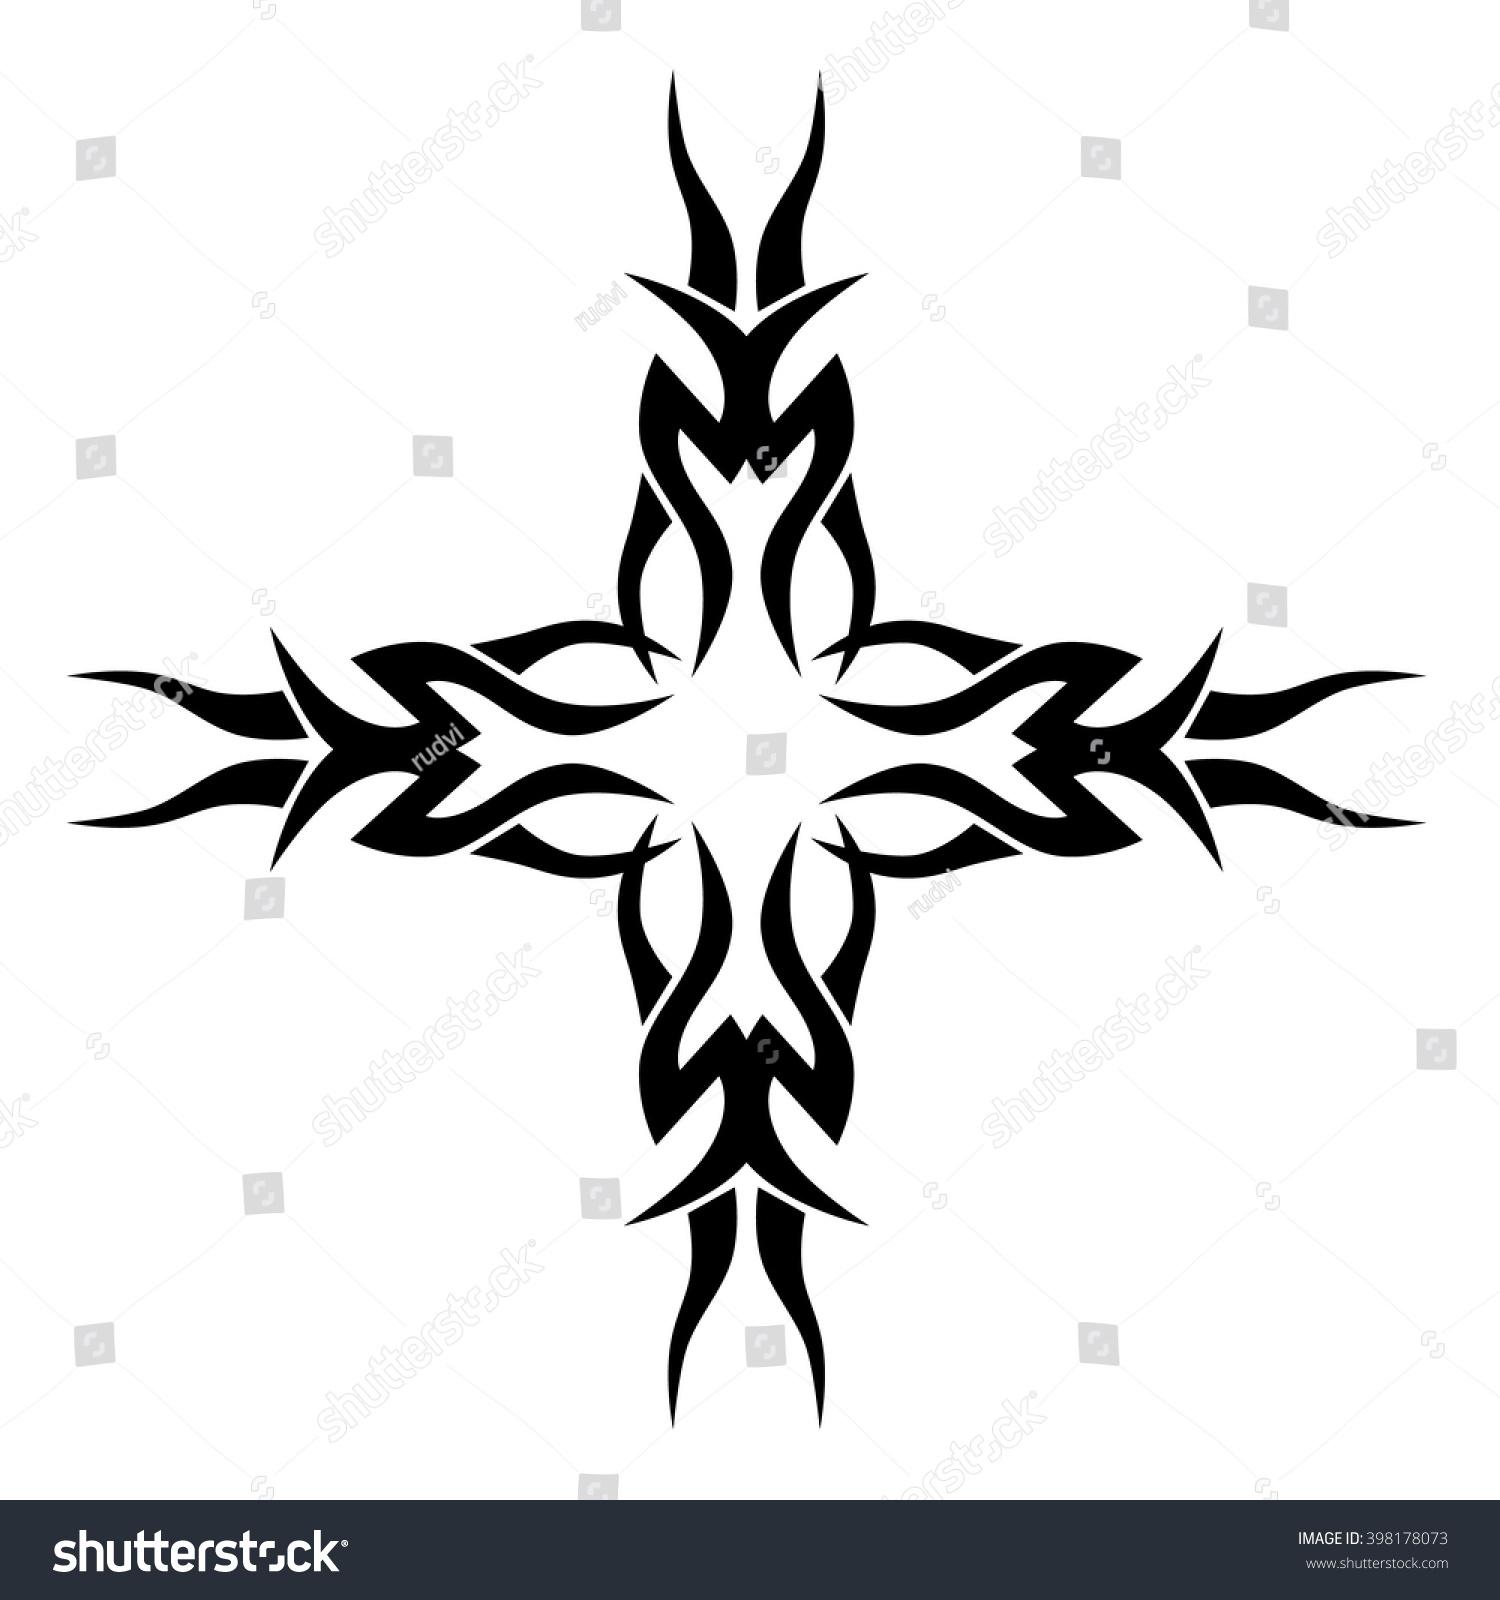 1500x1600 Tribal Art Cross Tattoos Tribal Tattoo Design Vector Sketch Art